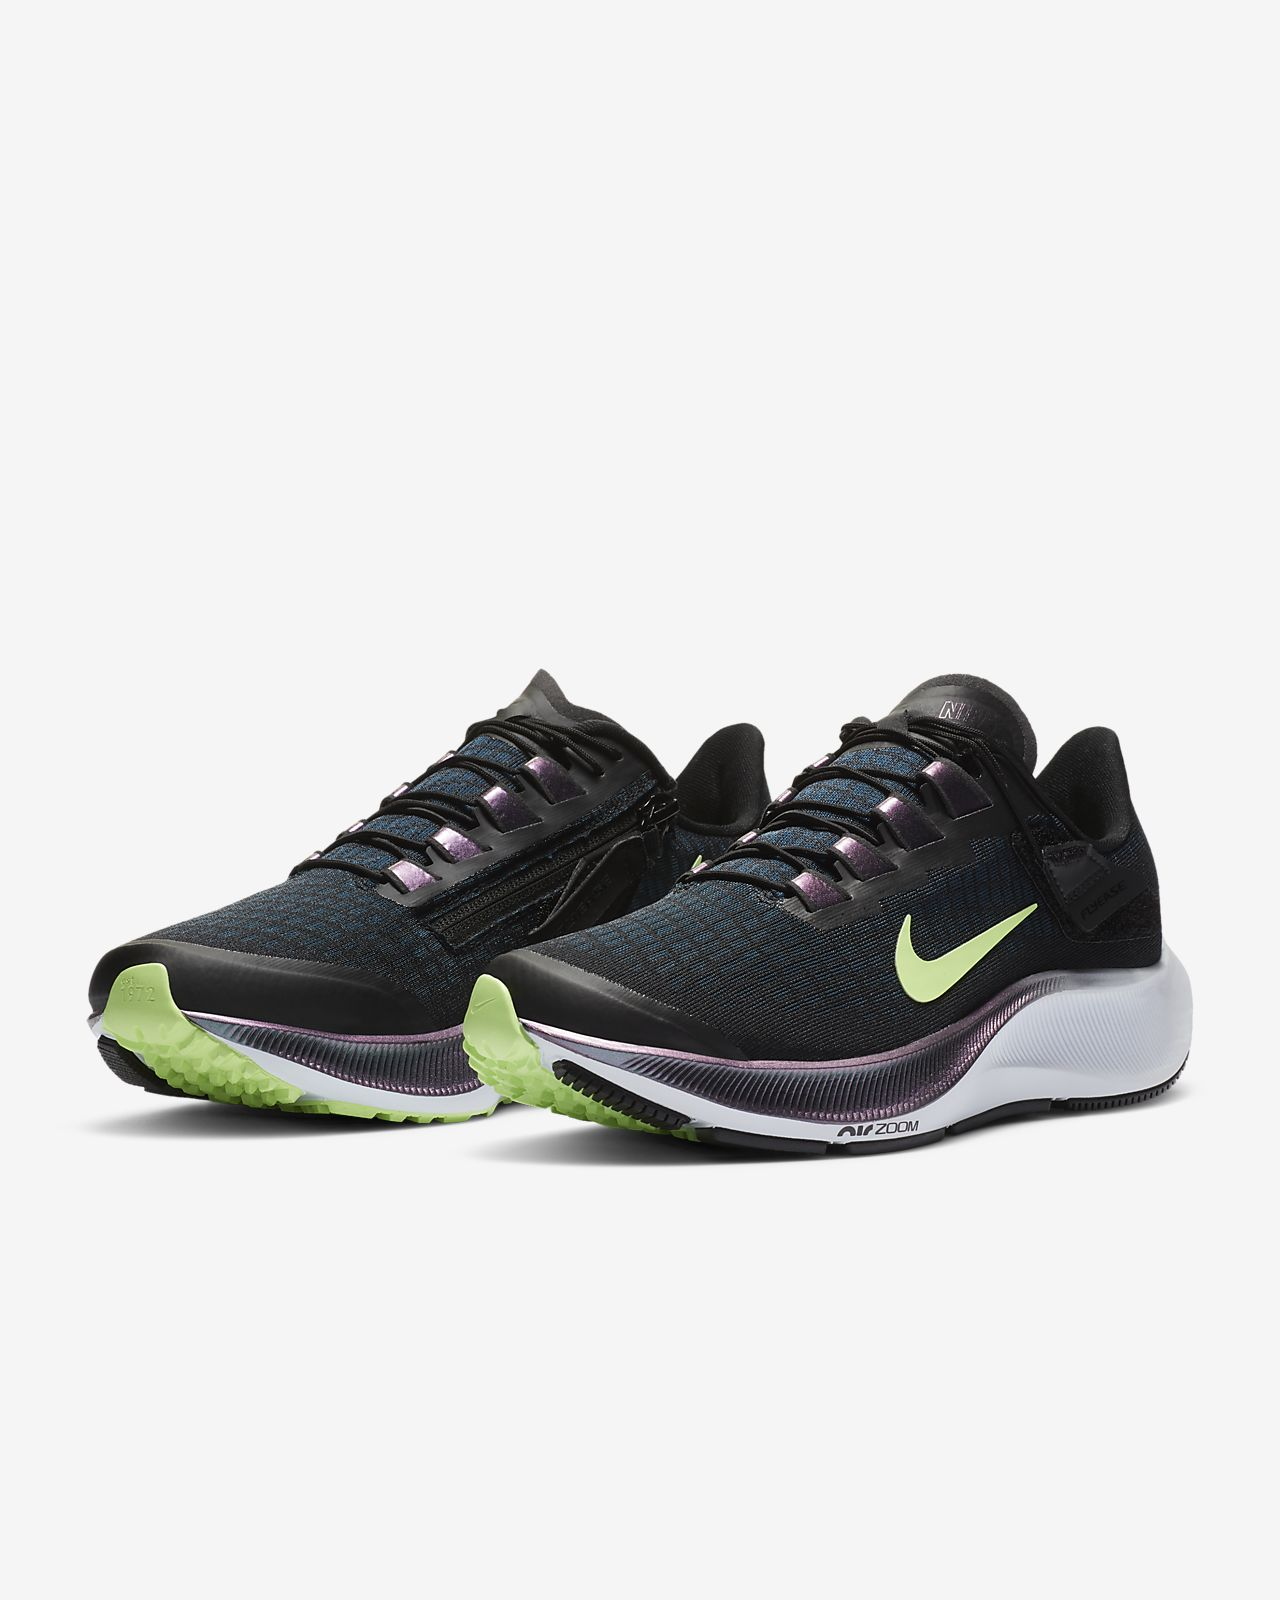 cebra hospital acantilado  Nike Pegasus 36 FlyEase Extra Wide Mes Running Shoe